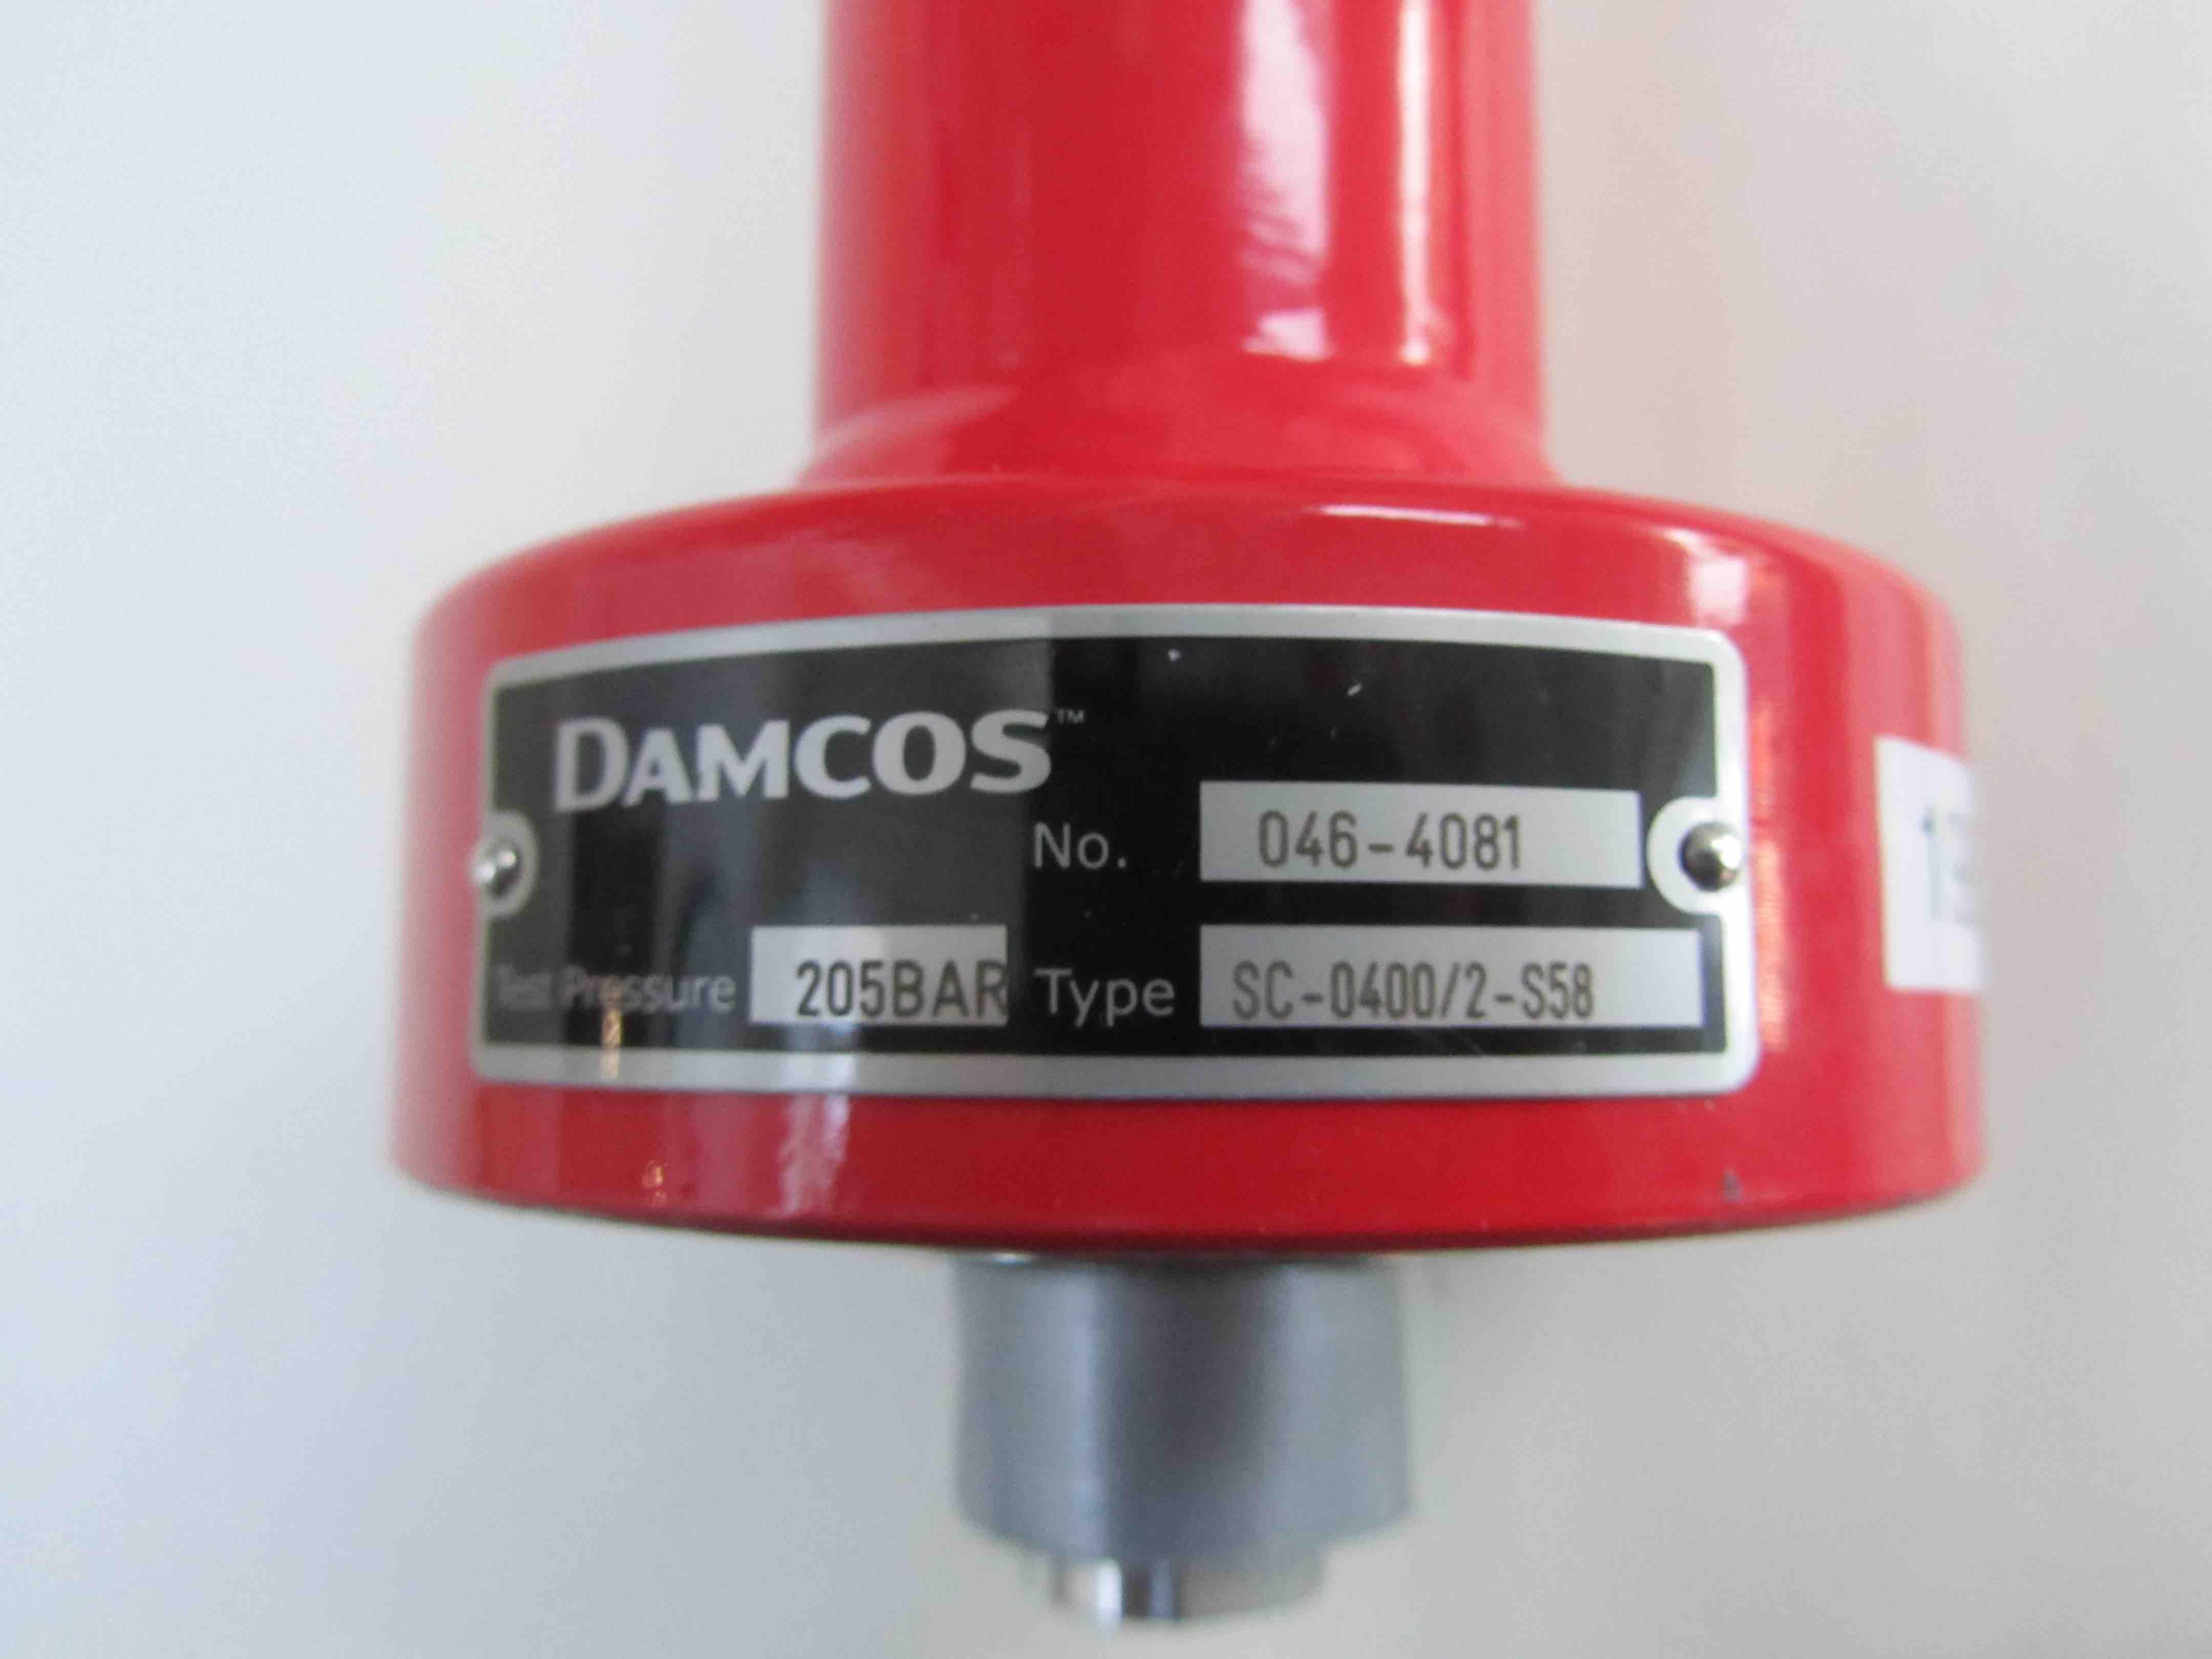 Damcos SC-0400:2-S58